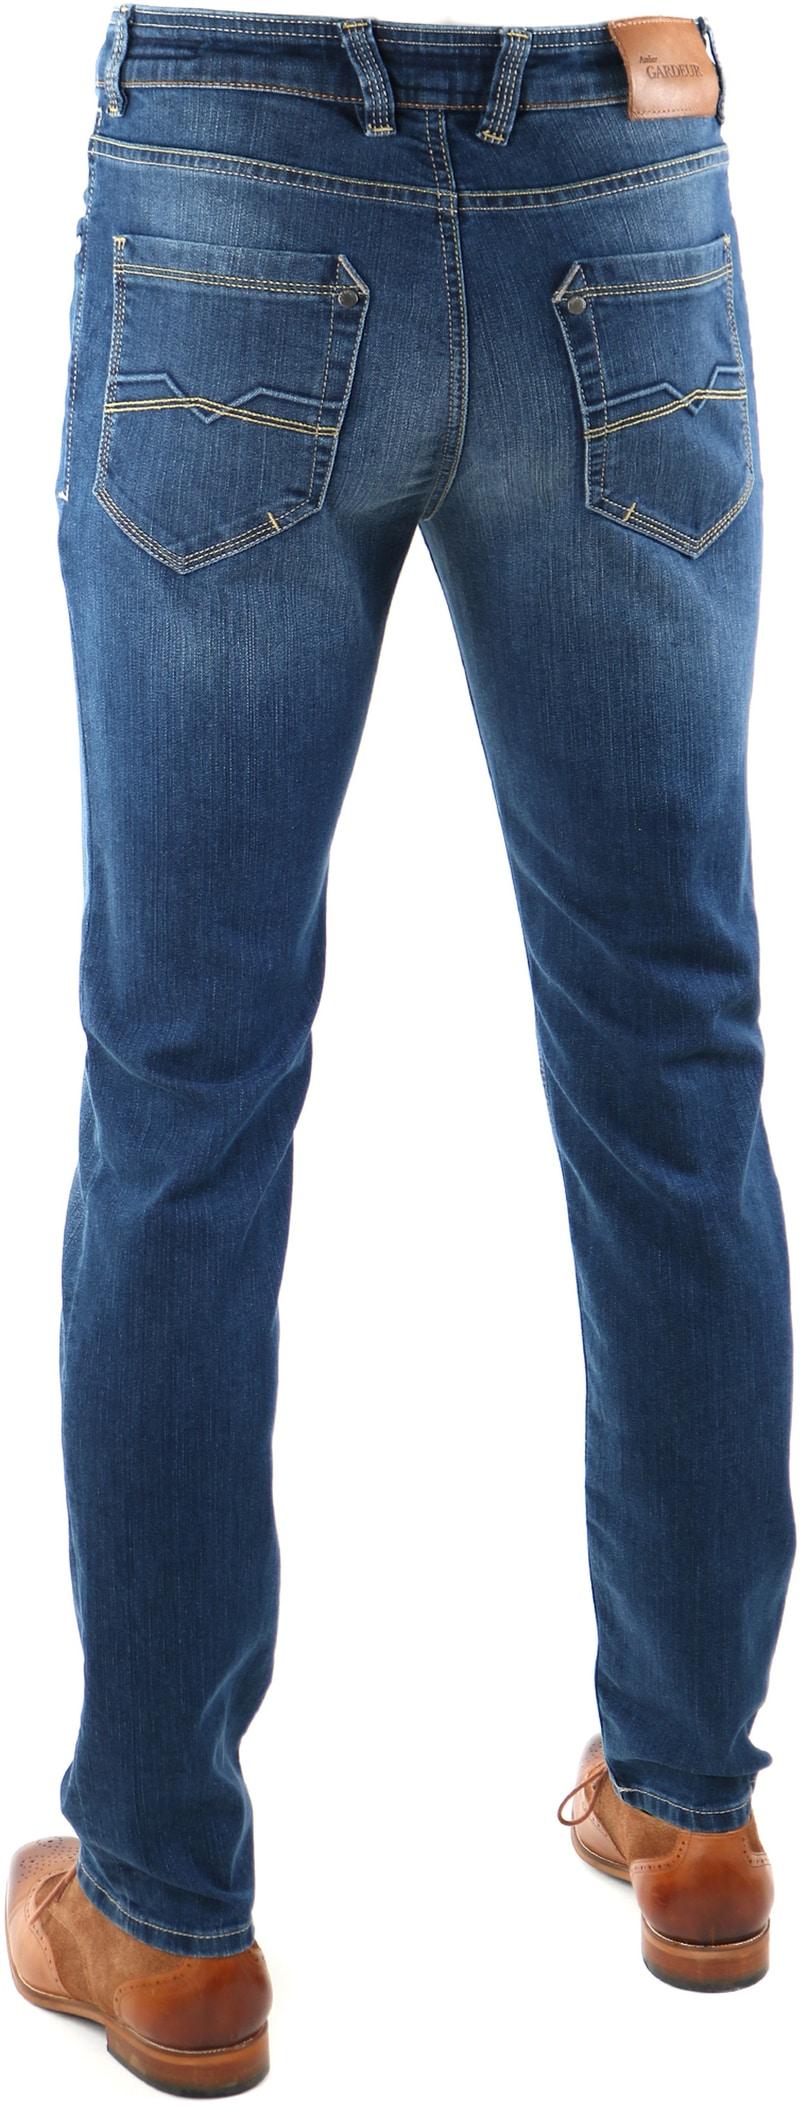 Gardeur Batu Stretch Jeans Blue photo 3